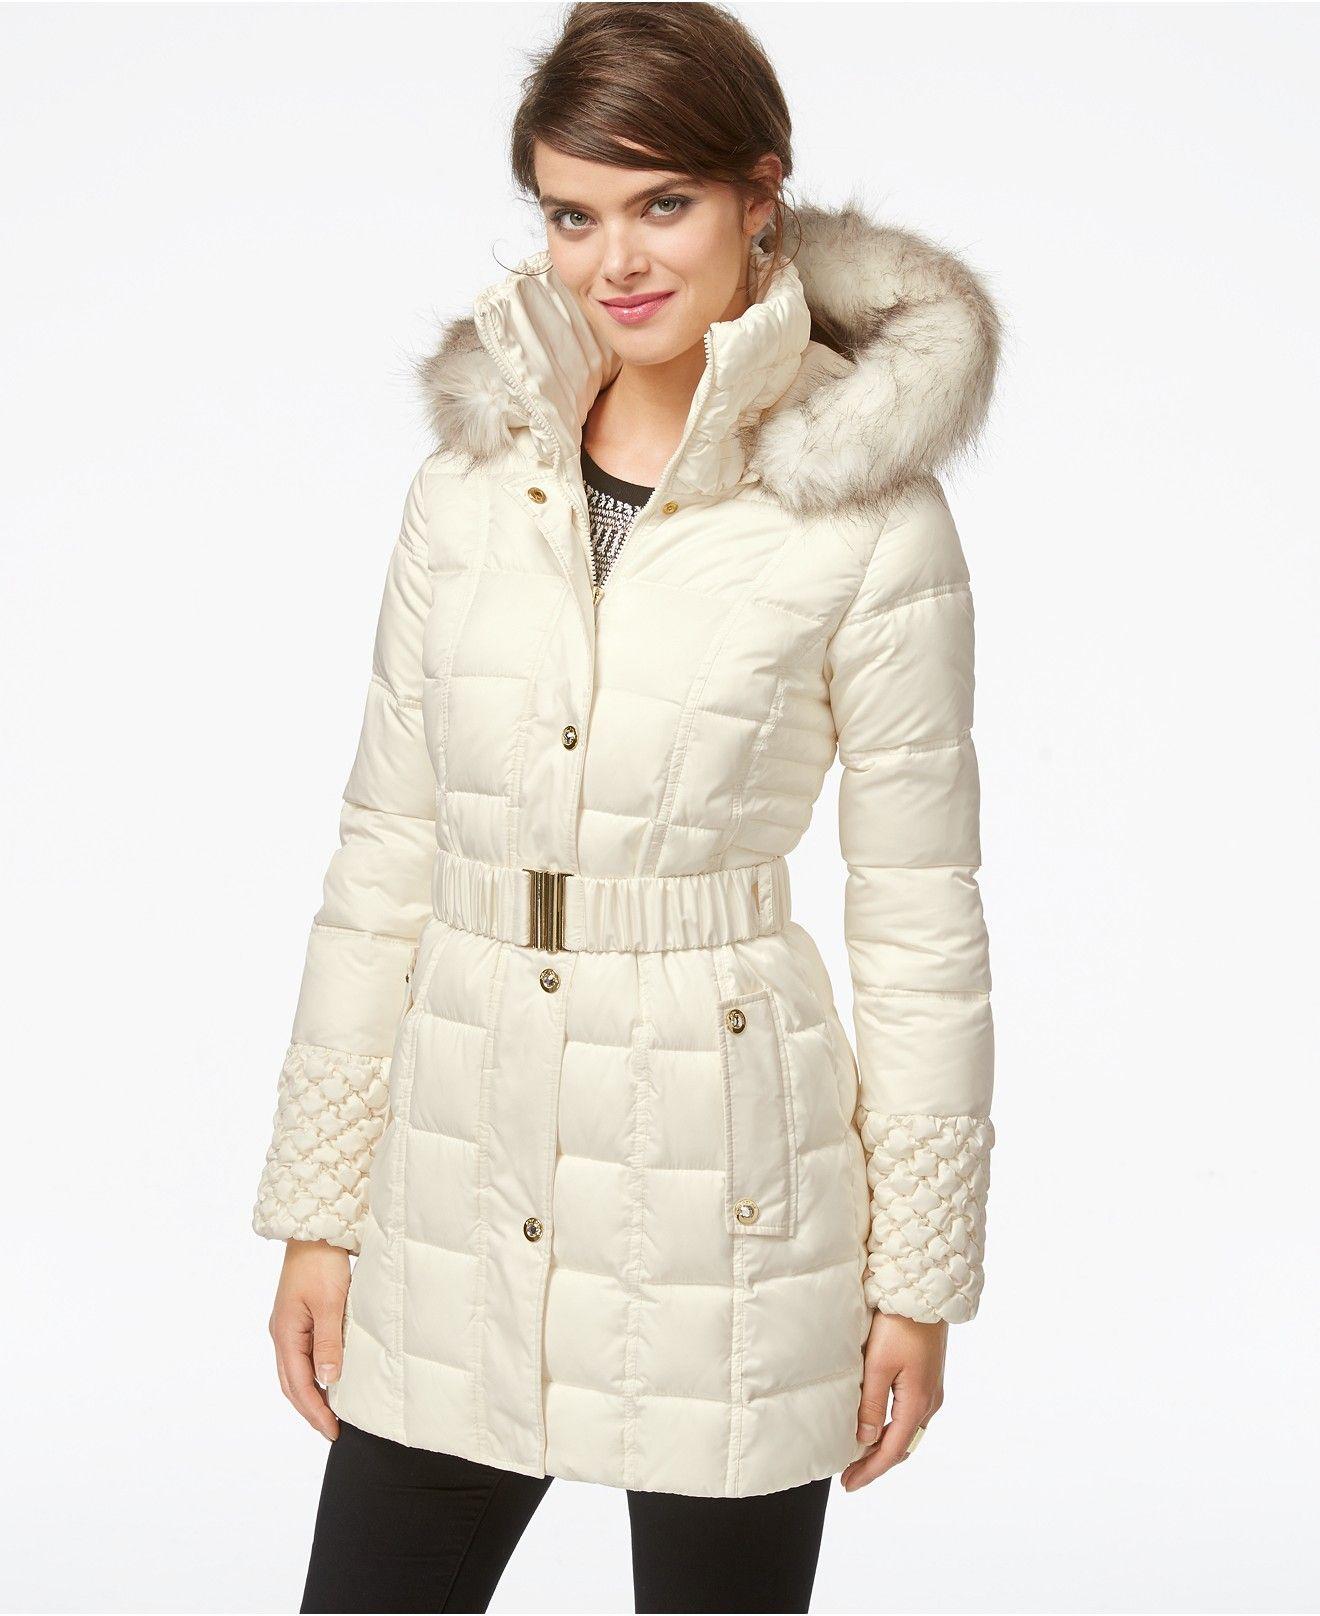 ea9d967a3ec Betsey Johnson Faux-Fur-Hood Belted Puffer Coat - Coats - Women - Macy s